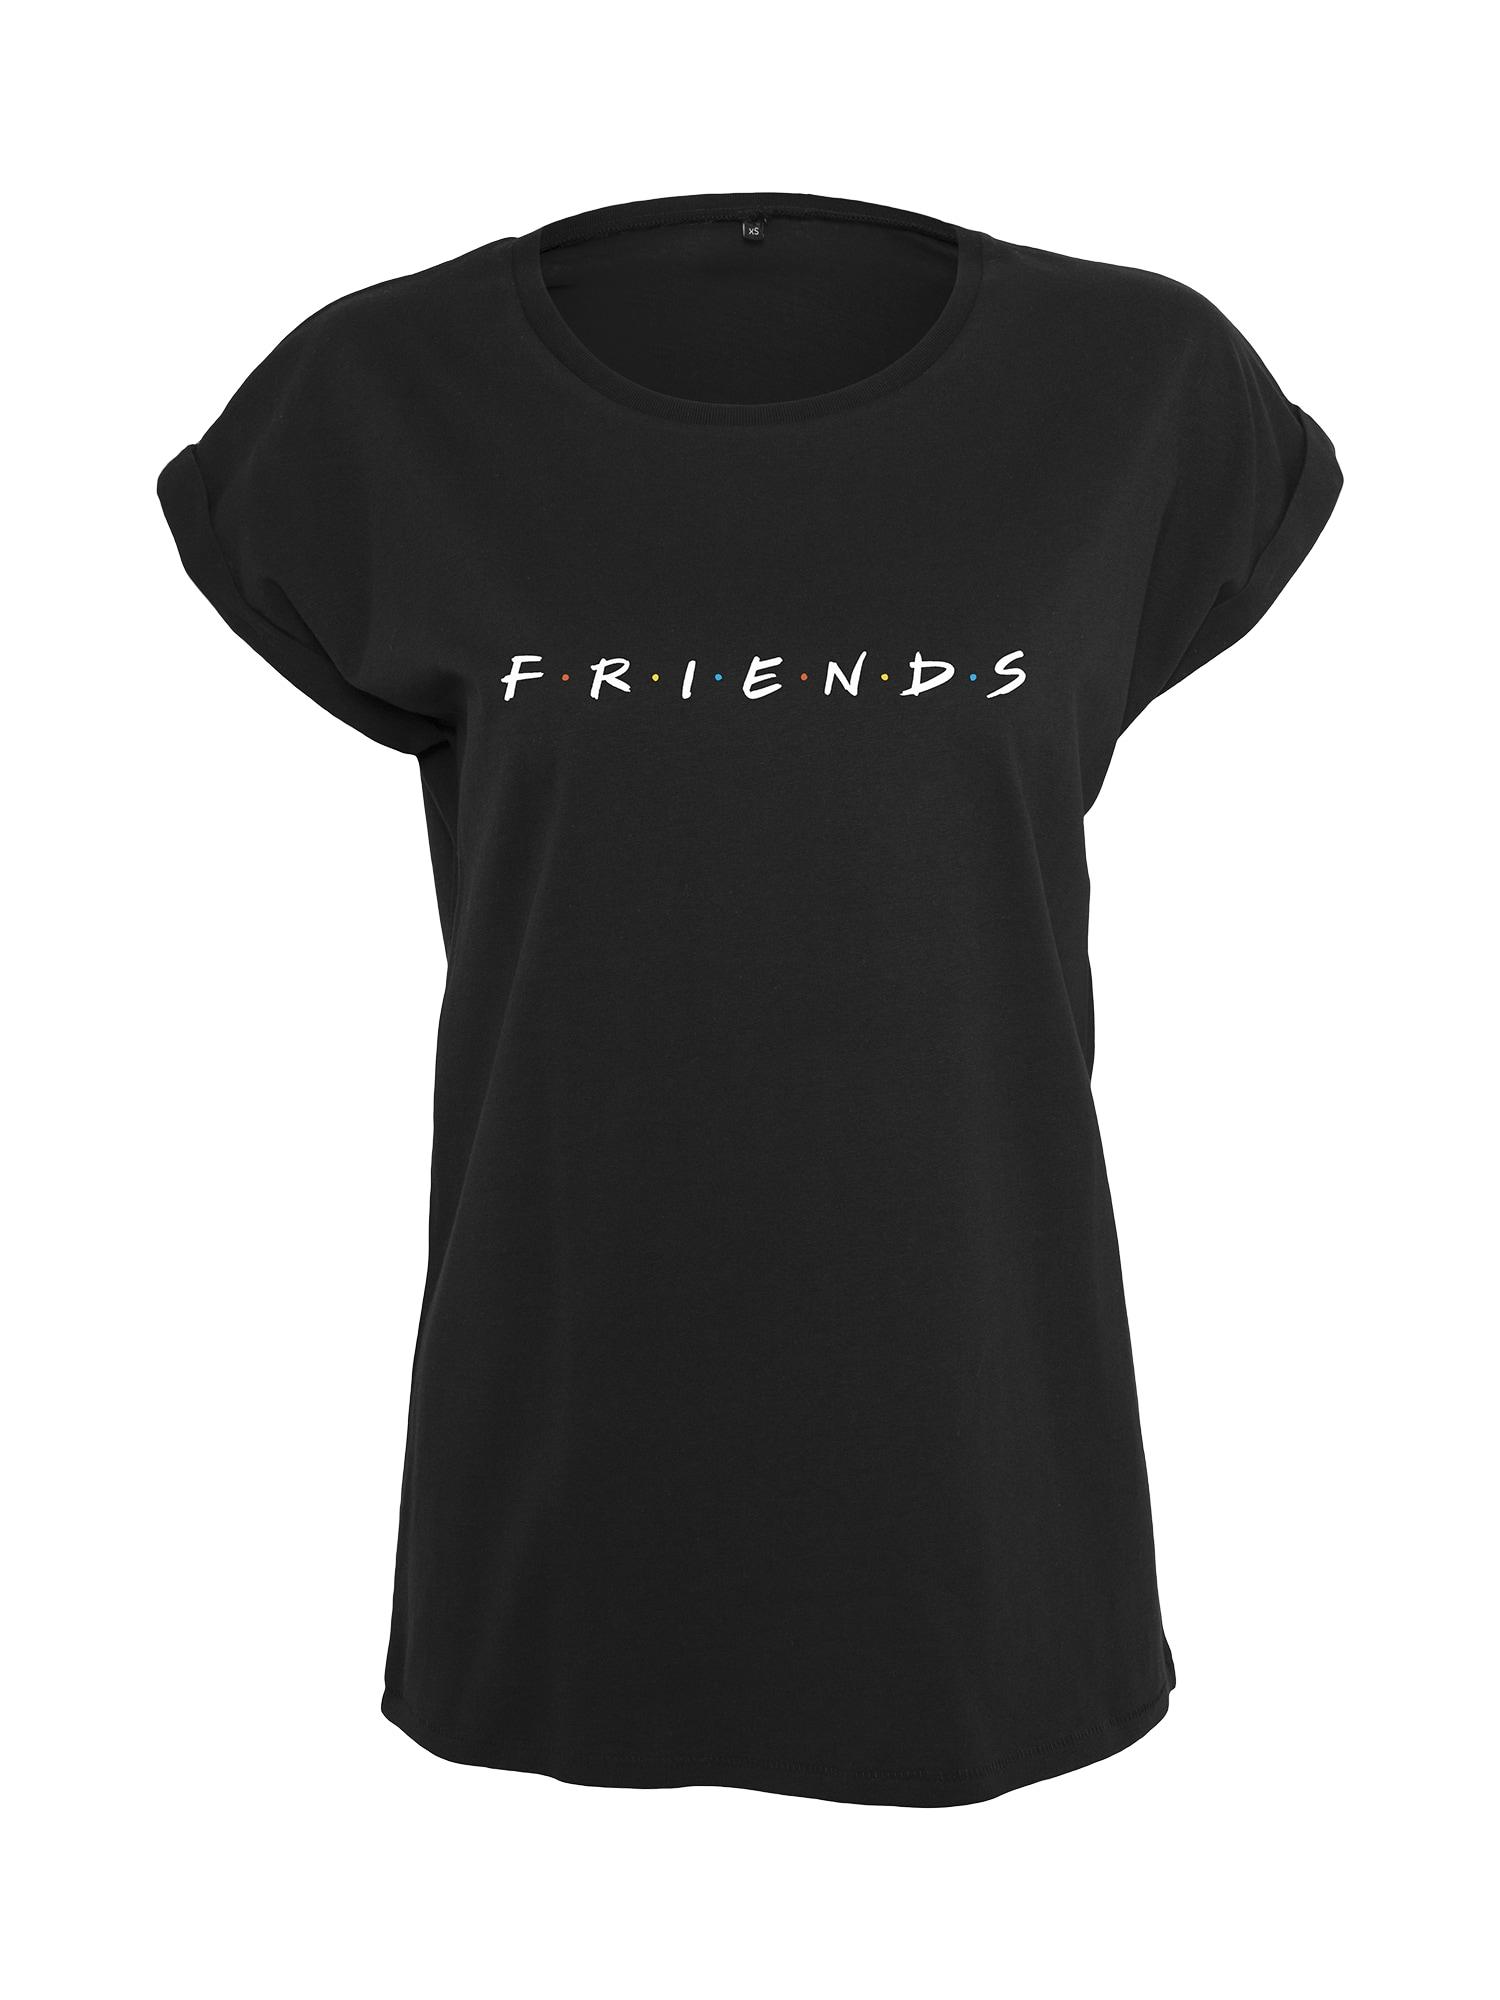 Tričko Ladies Friends Logo Tee černá Merchcode